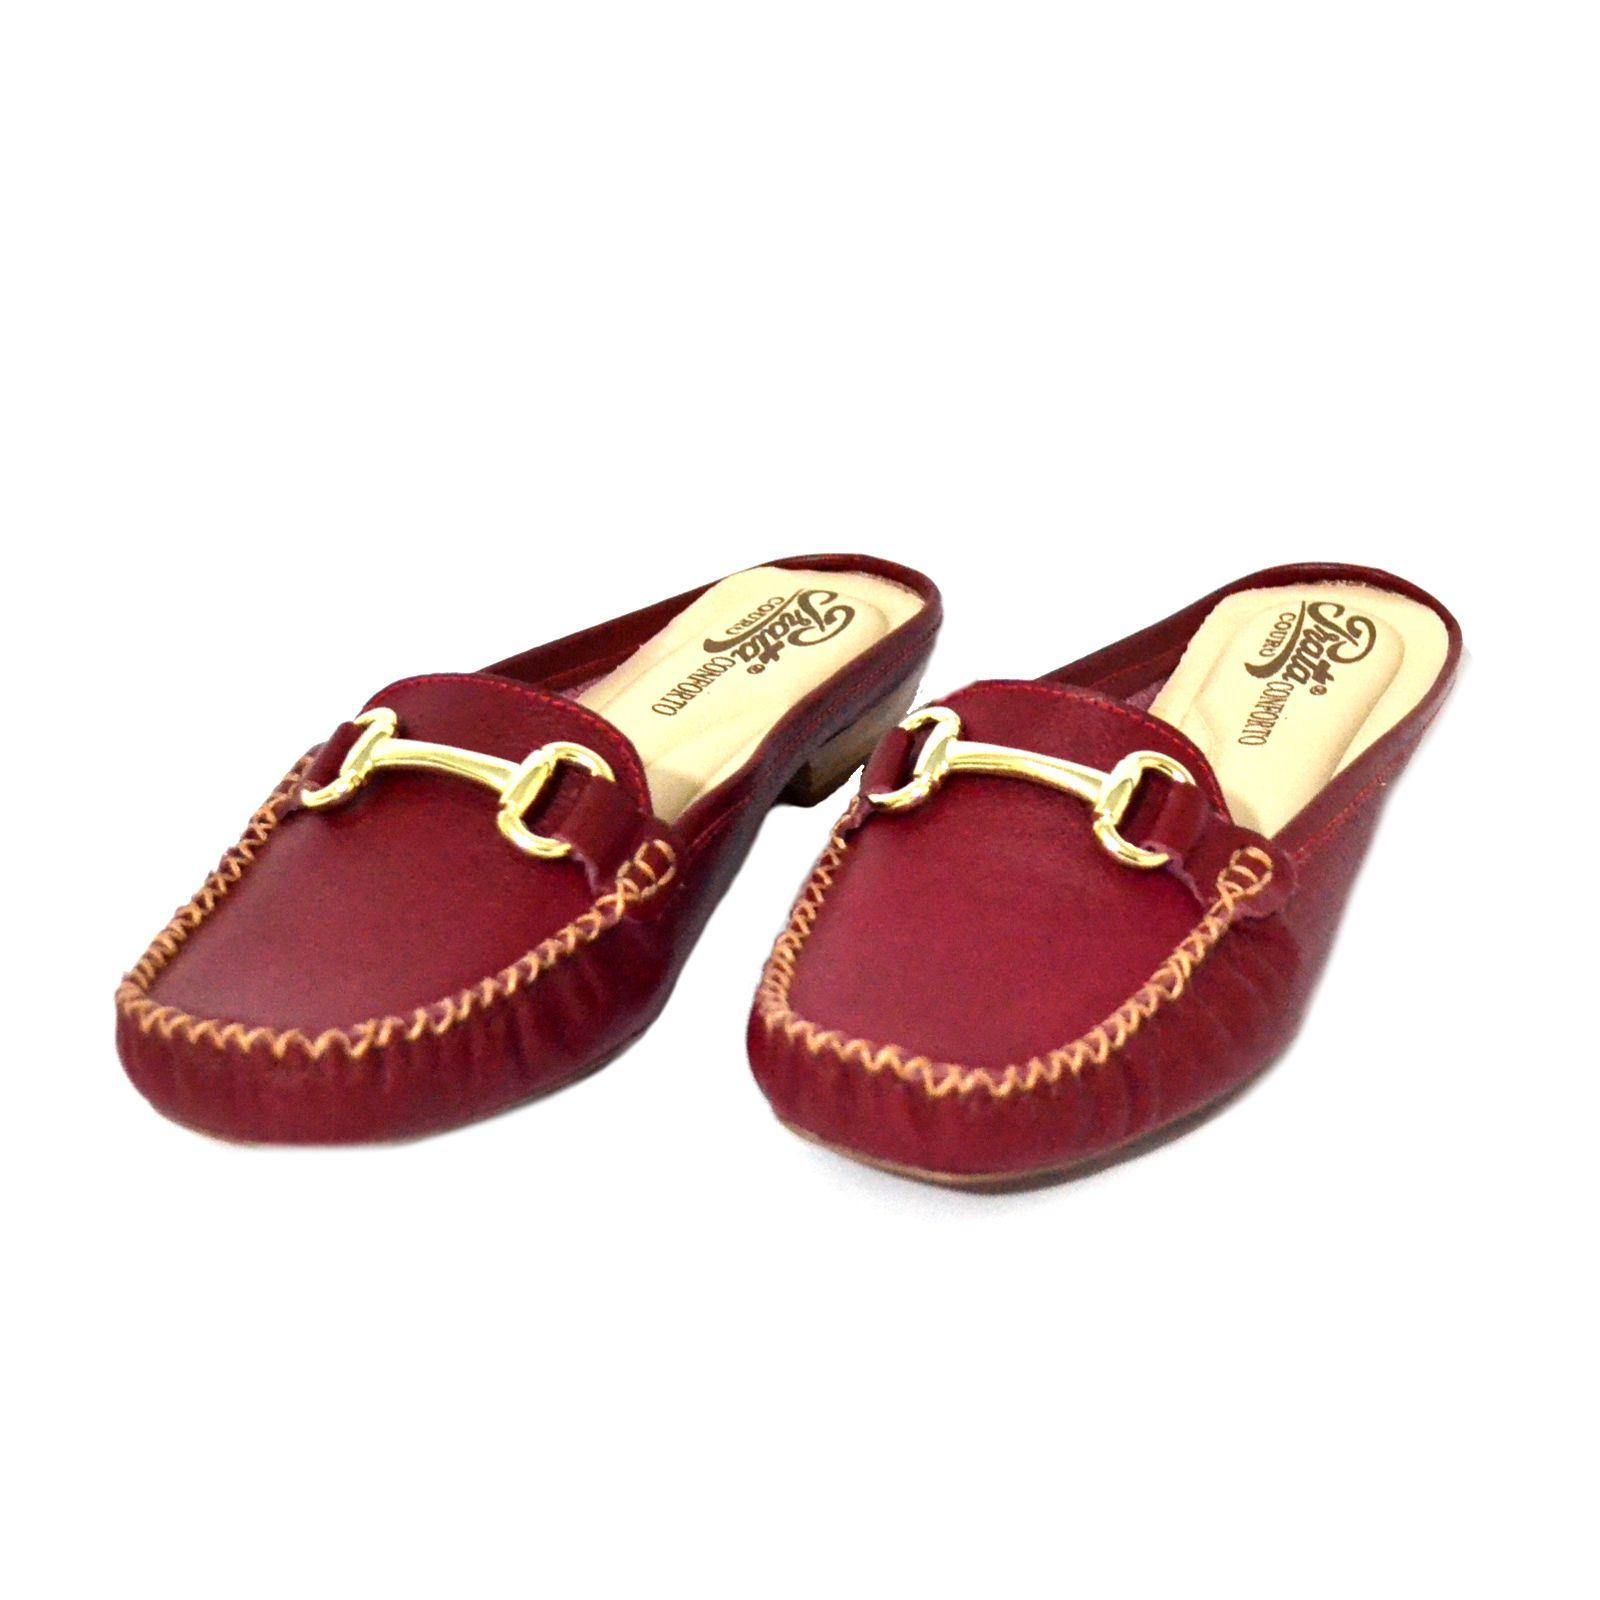 Mule Feminino  Prata Couro Confort 1009626 Vermelho